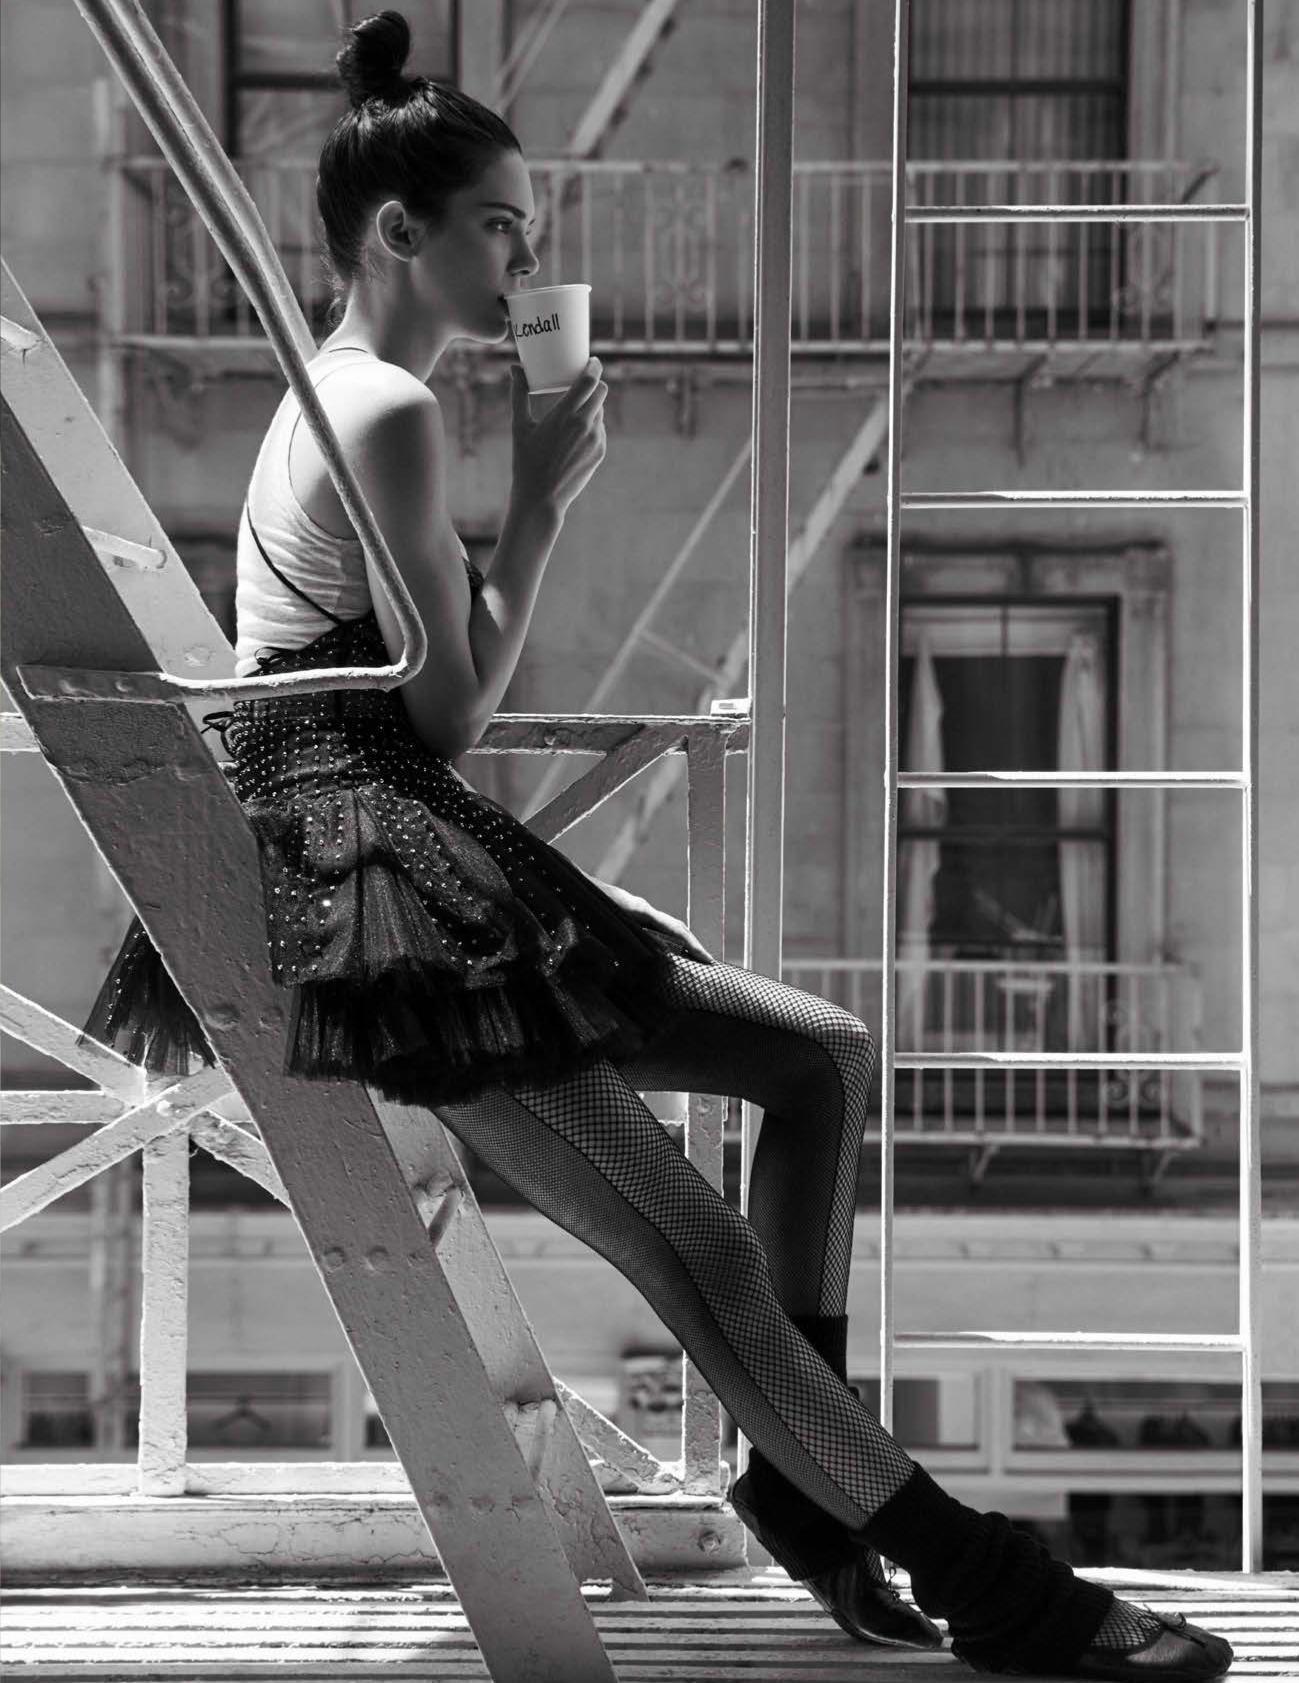 майка из хлопка, American Vintage; балетное платье из тюля с декором из черных стразов Swarovski, Valentino; колготки, Calzedonia; балетки, Repetto; гетры, Capezio